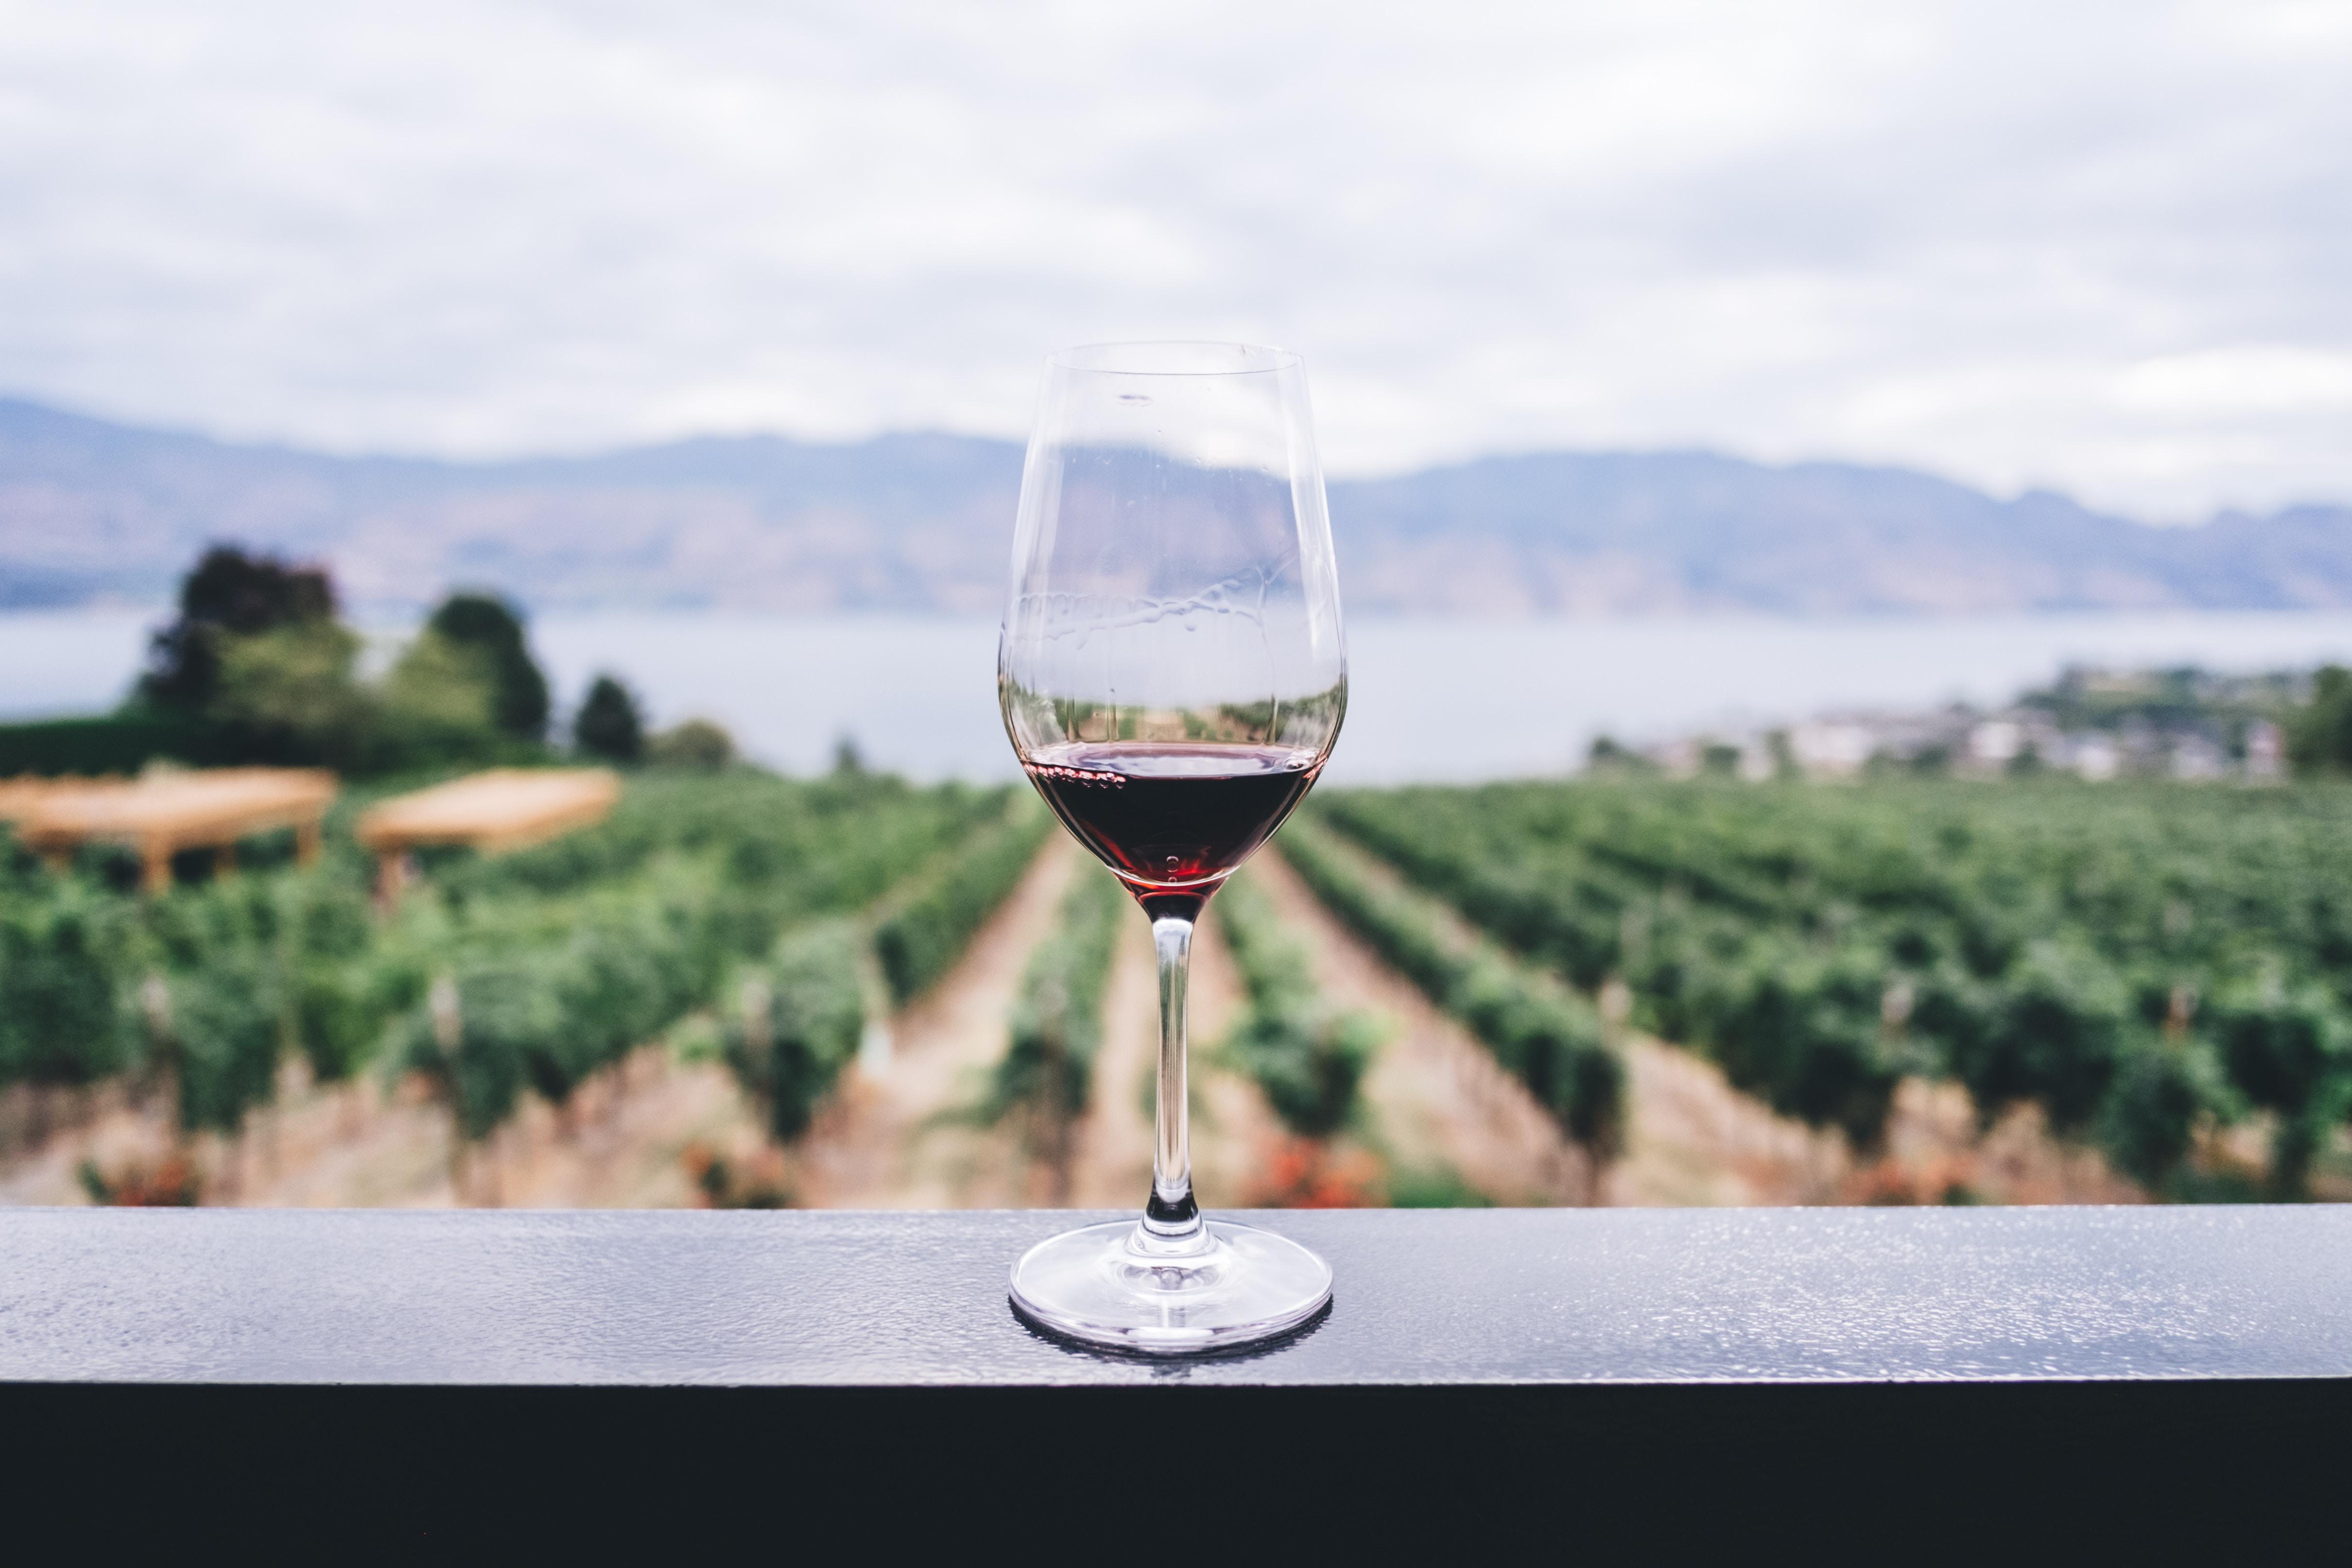 romance_winery_wine_glass_unsplash.jpg